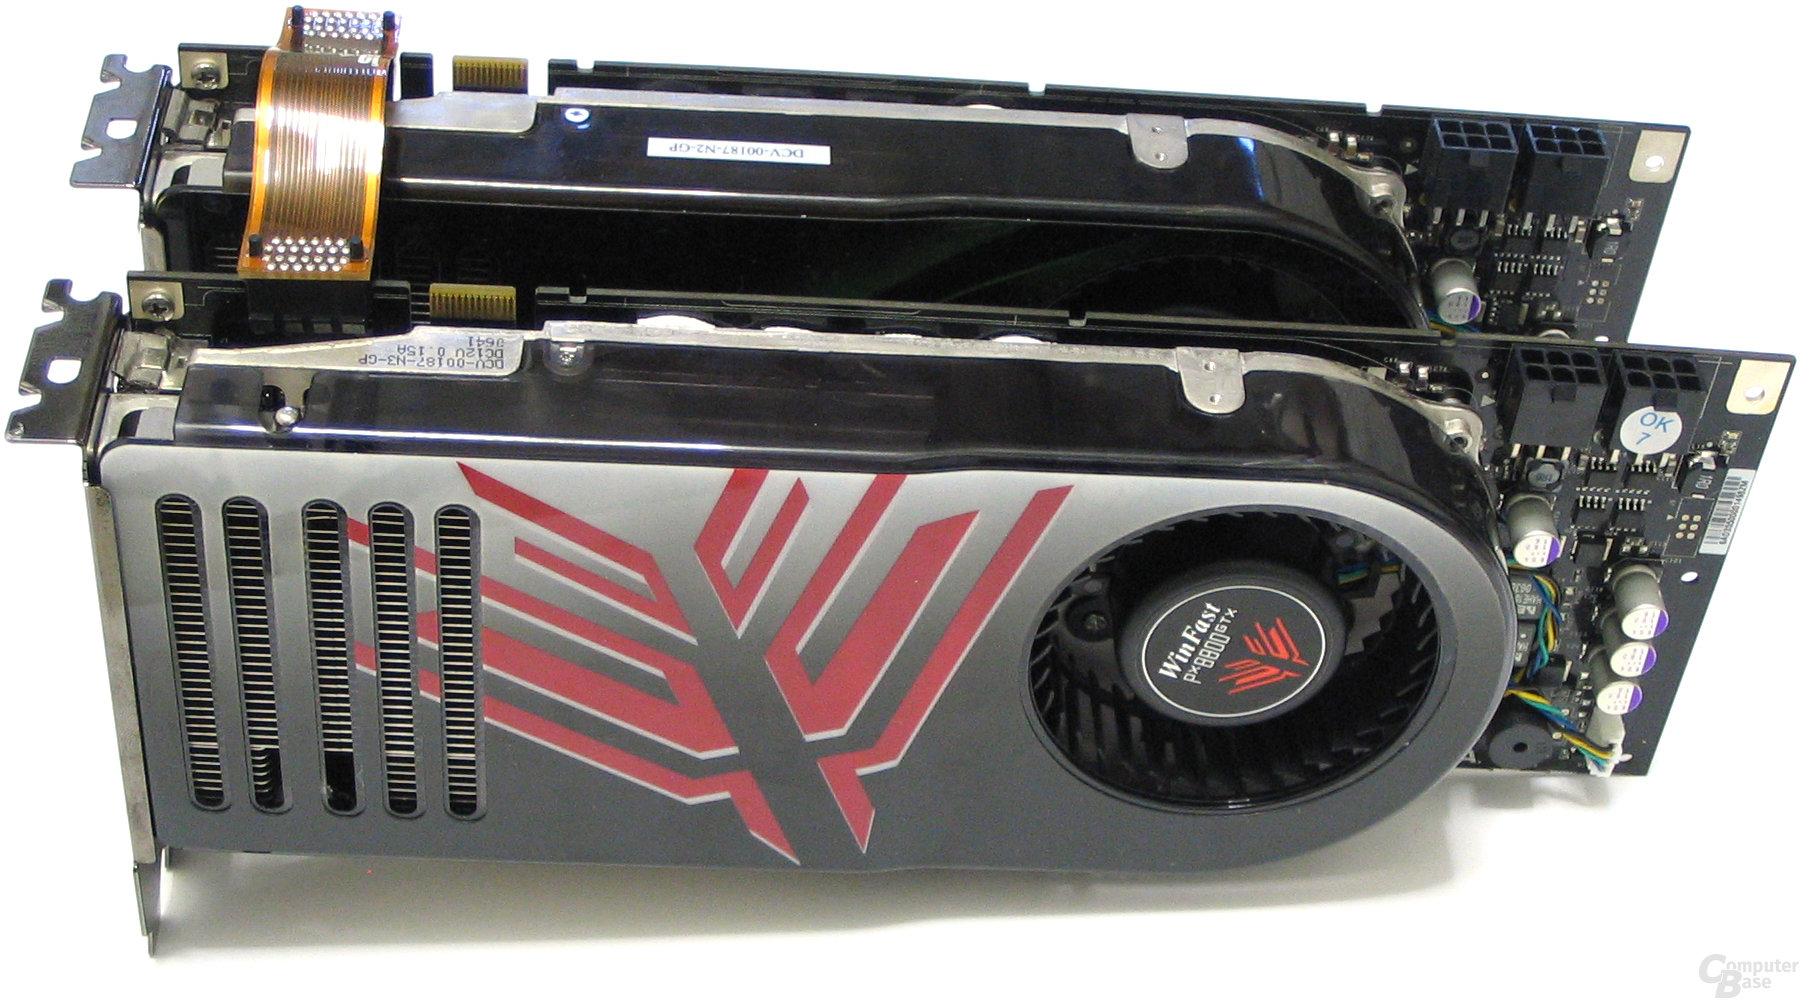 GeForce 8800 GTX SLI